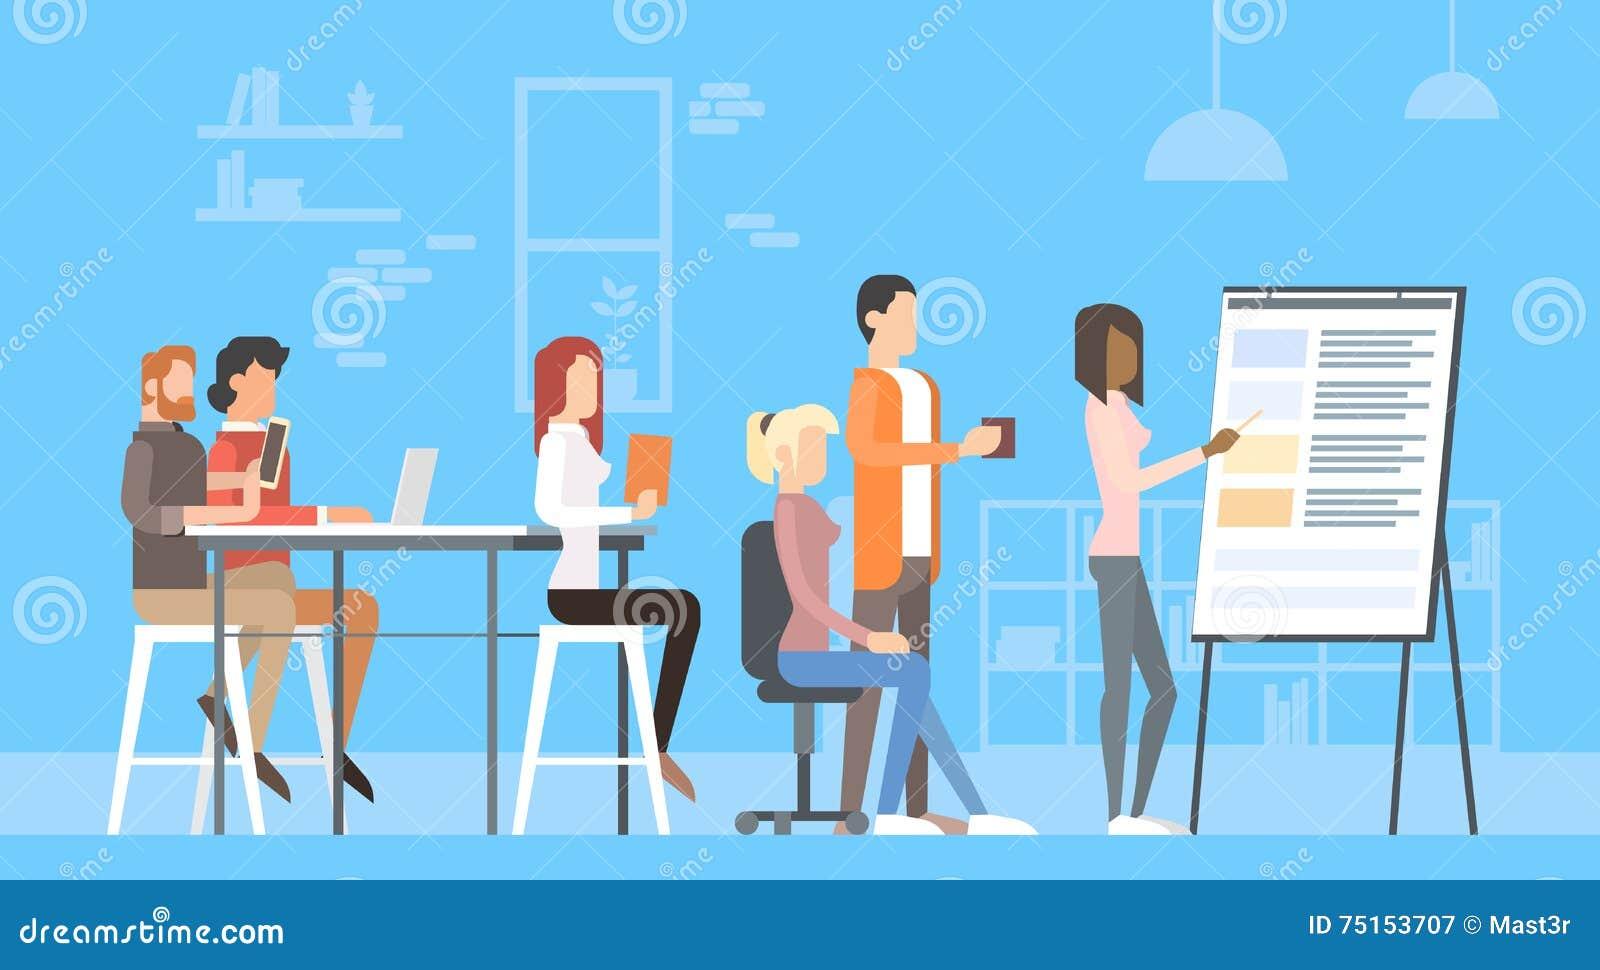 Creative Office Center People Sitting Desk Working Presentation Flip Chart, Students Training University Campus